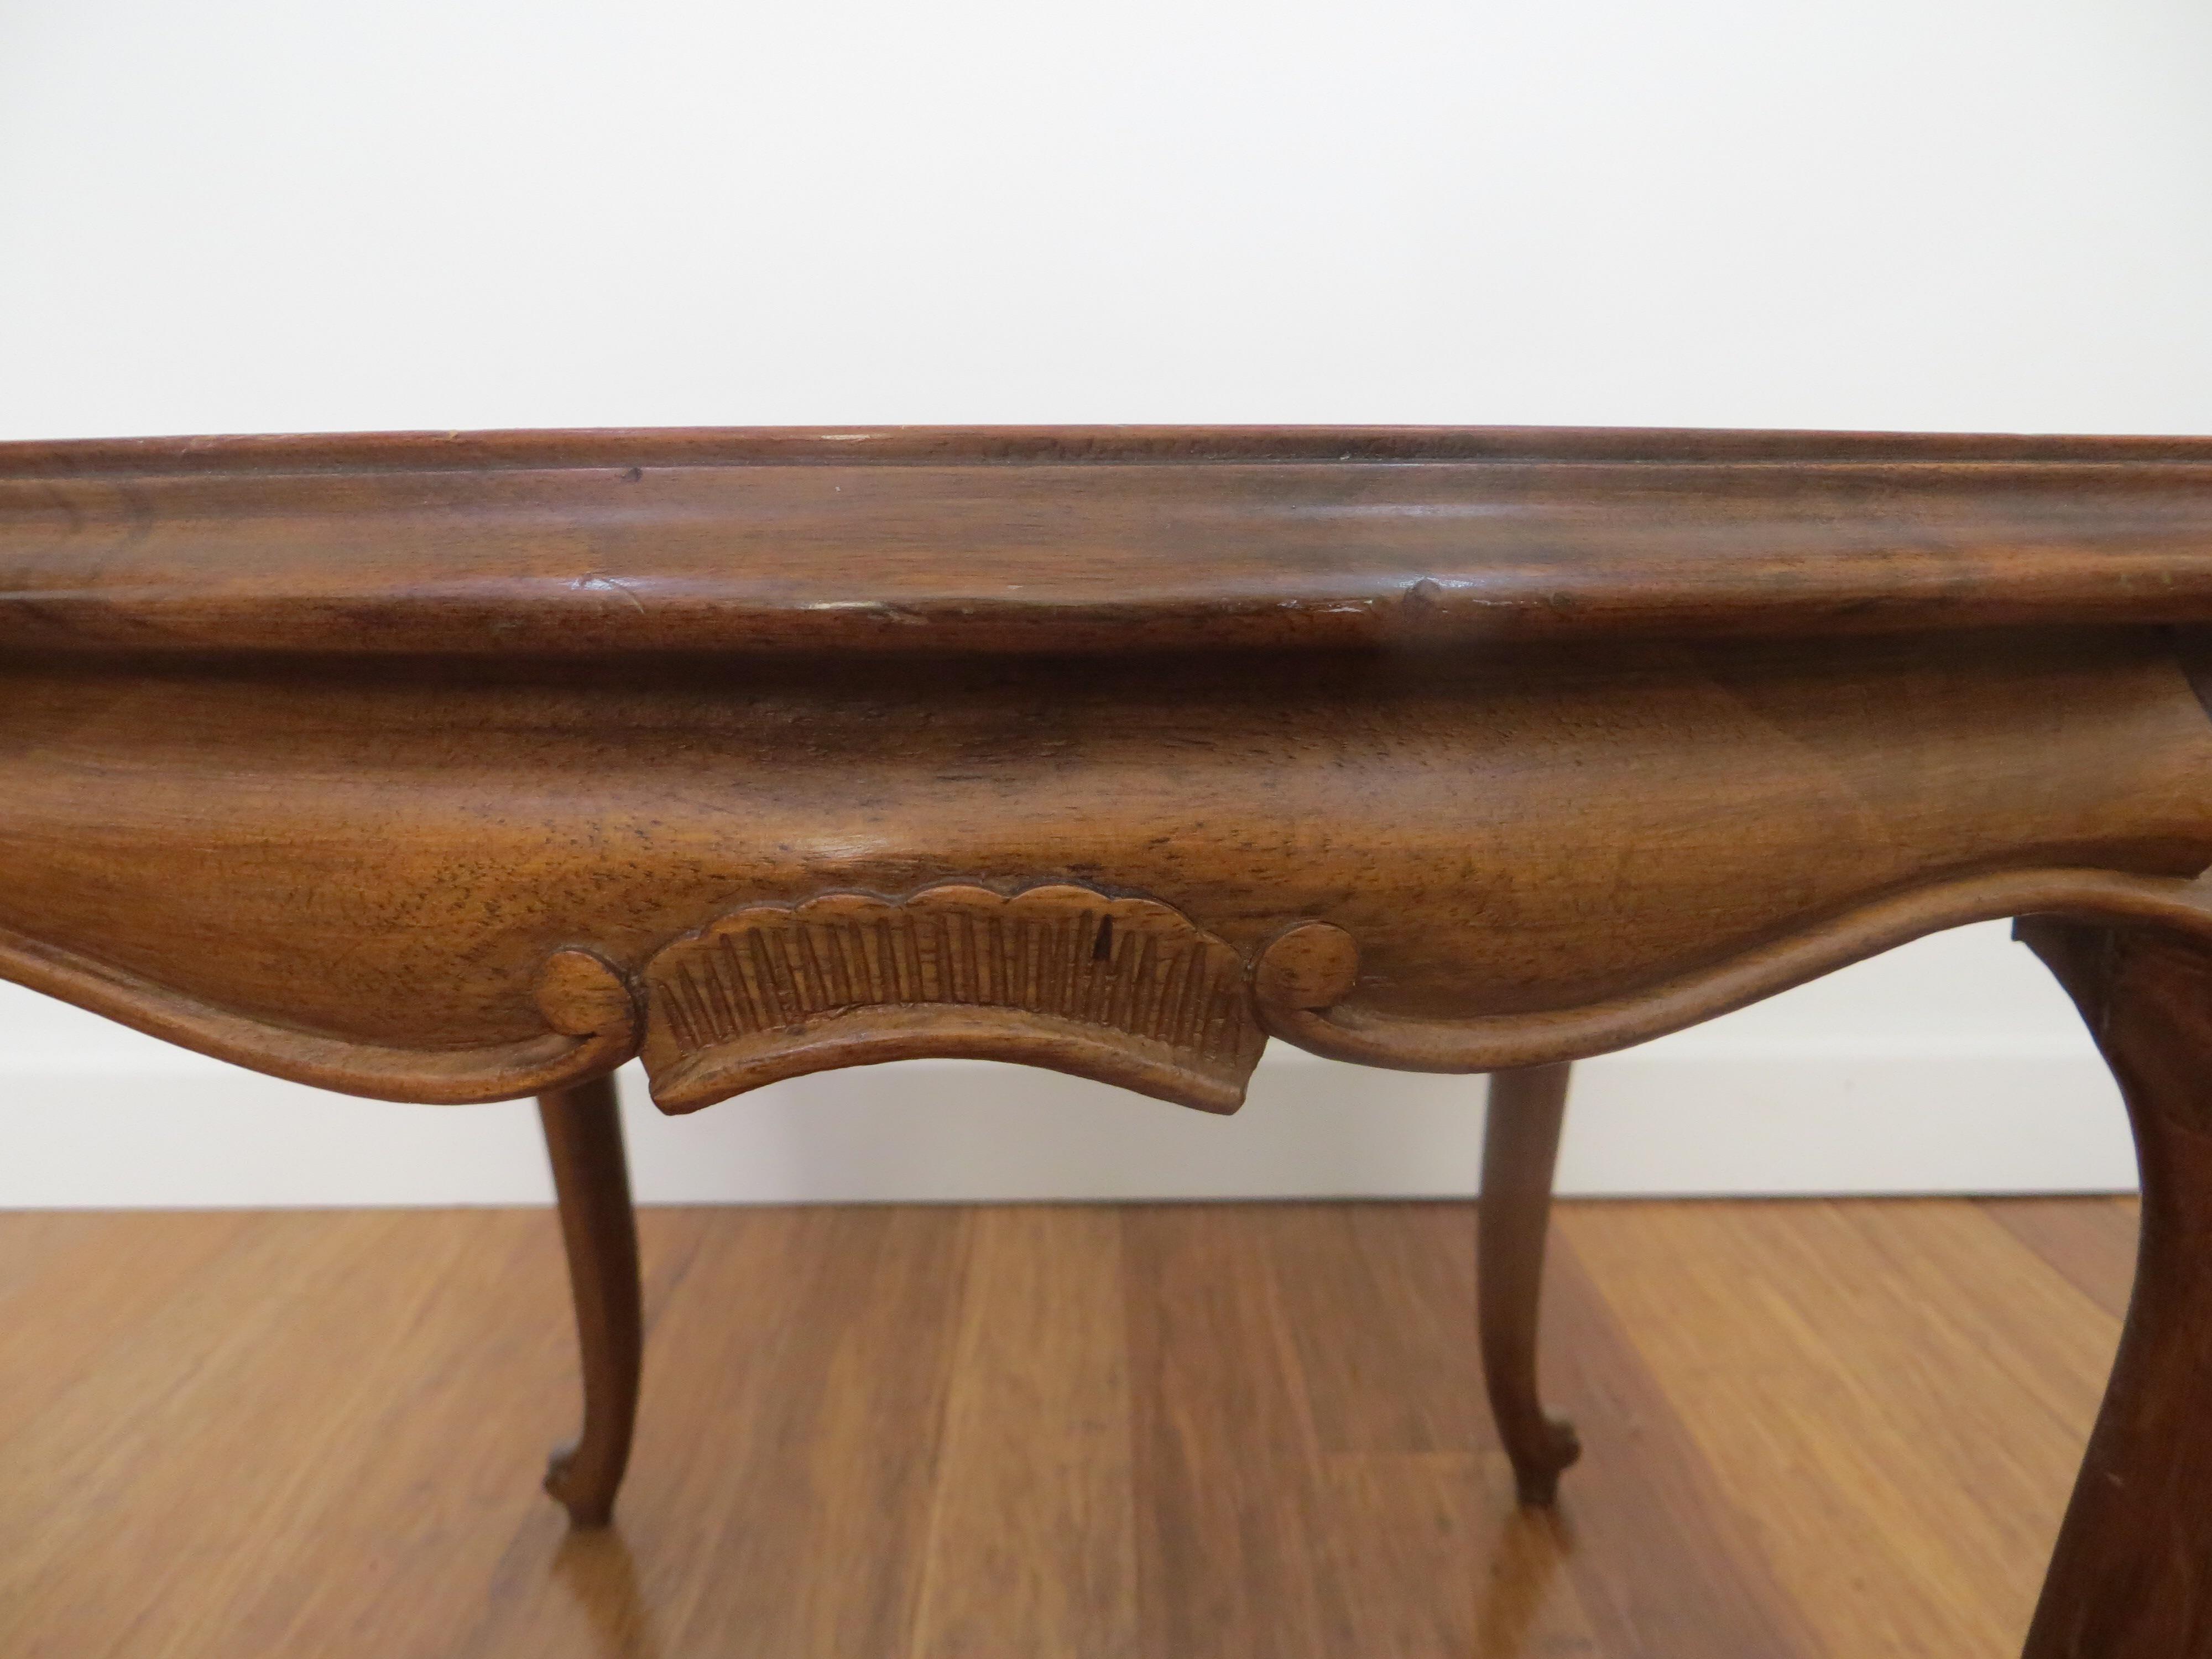 Genova Coffee Table: Molinari Vintage Italian Wooden Table